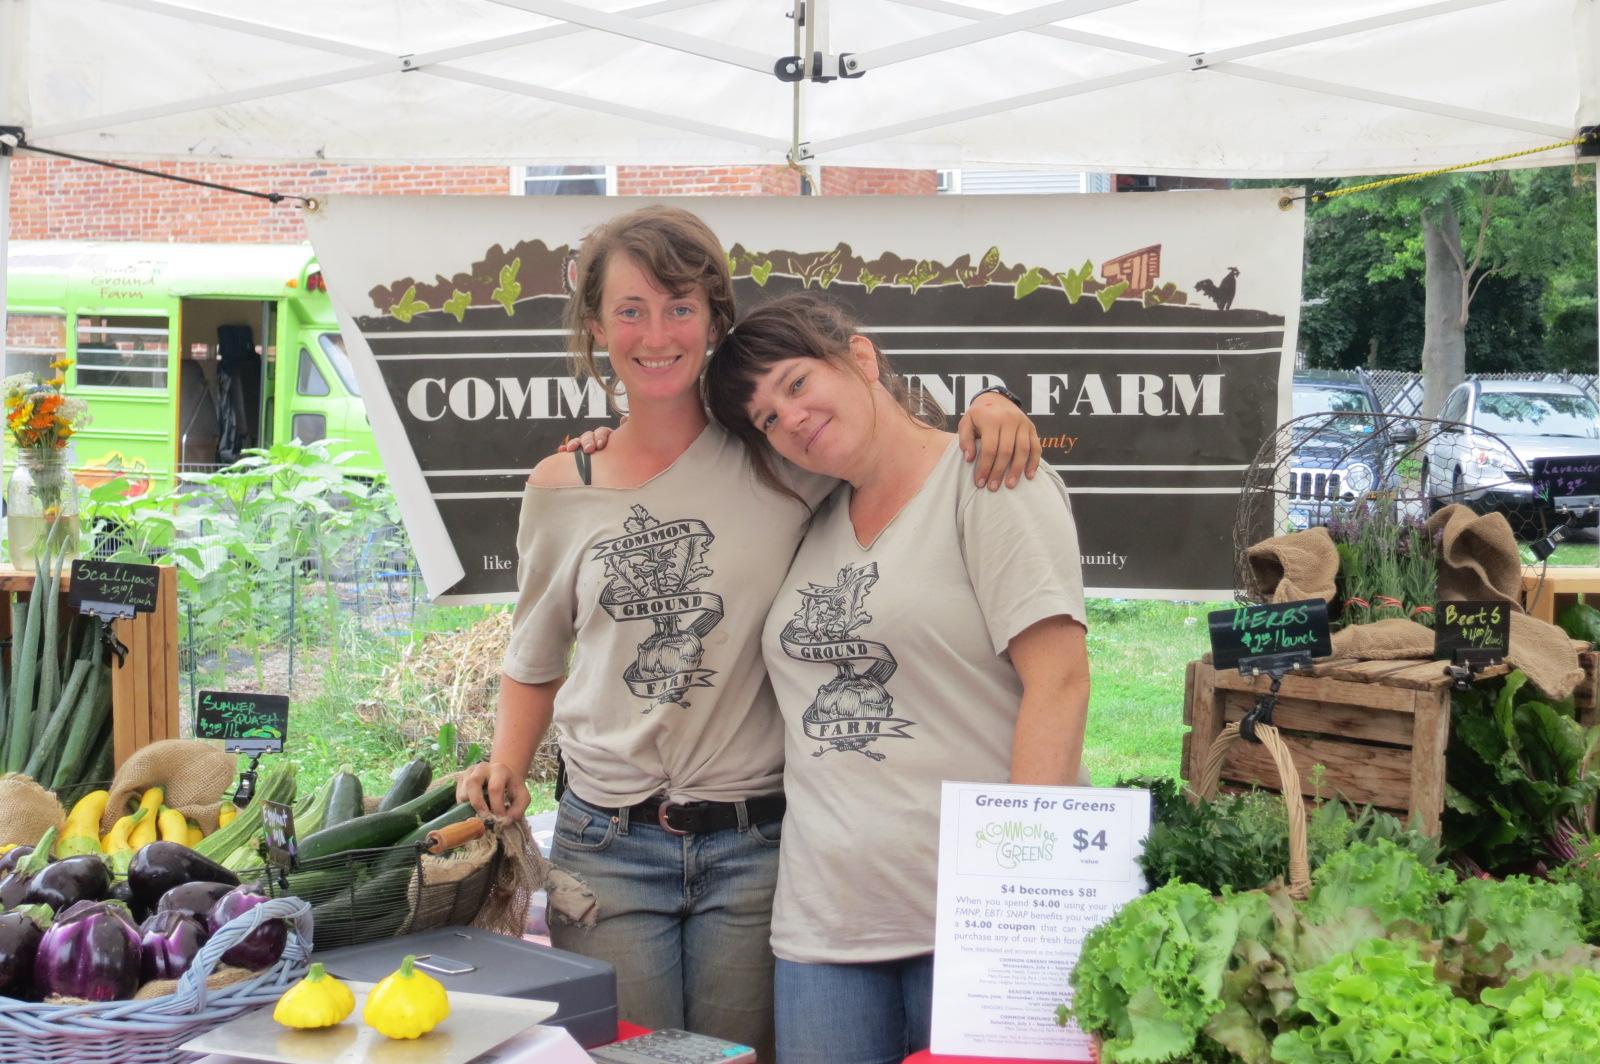 New Farm Market Pop-up on Main Street